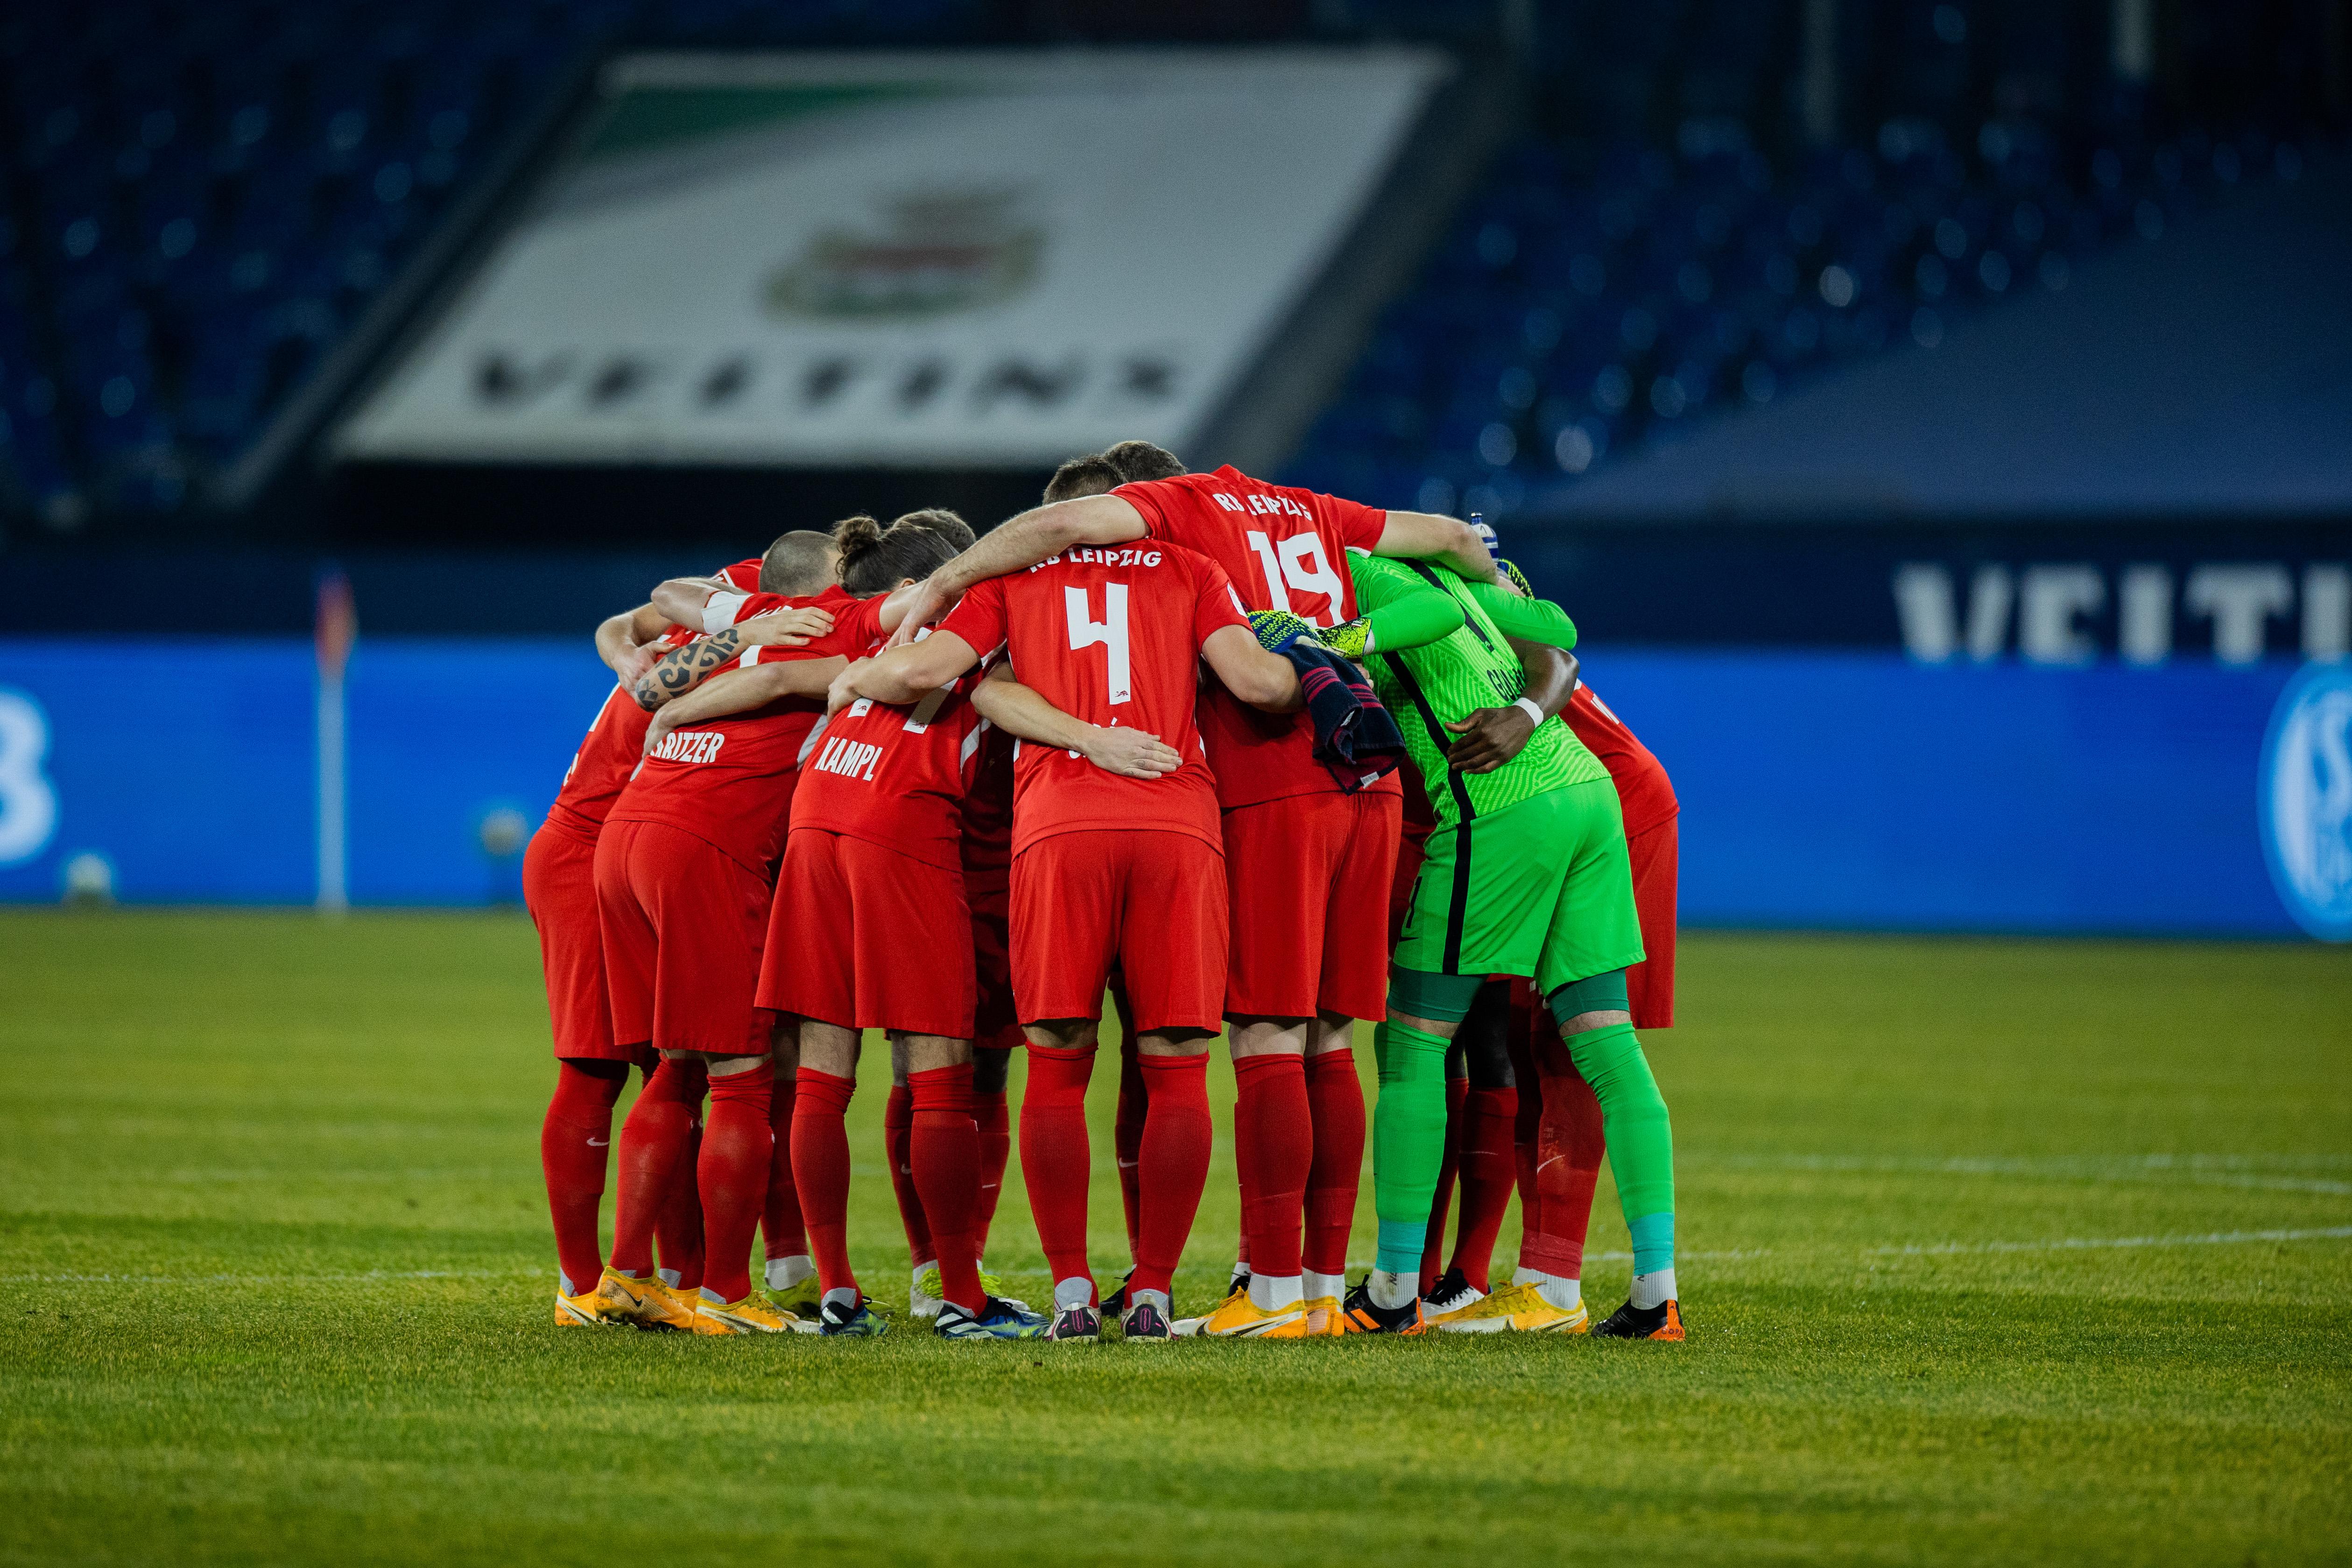 Budapesten fogadja a Leipzig a Liverpoolt